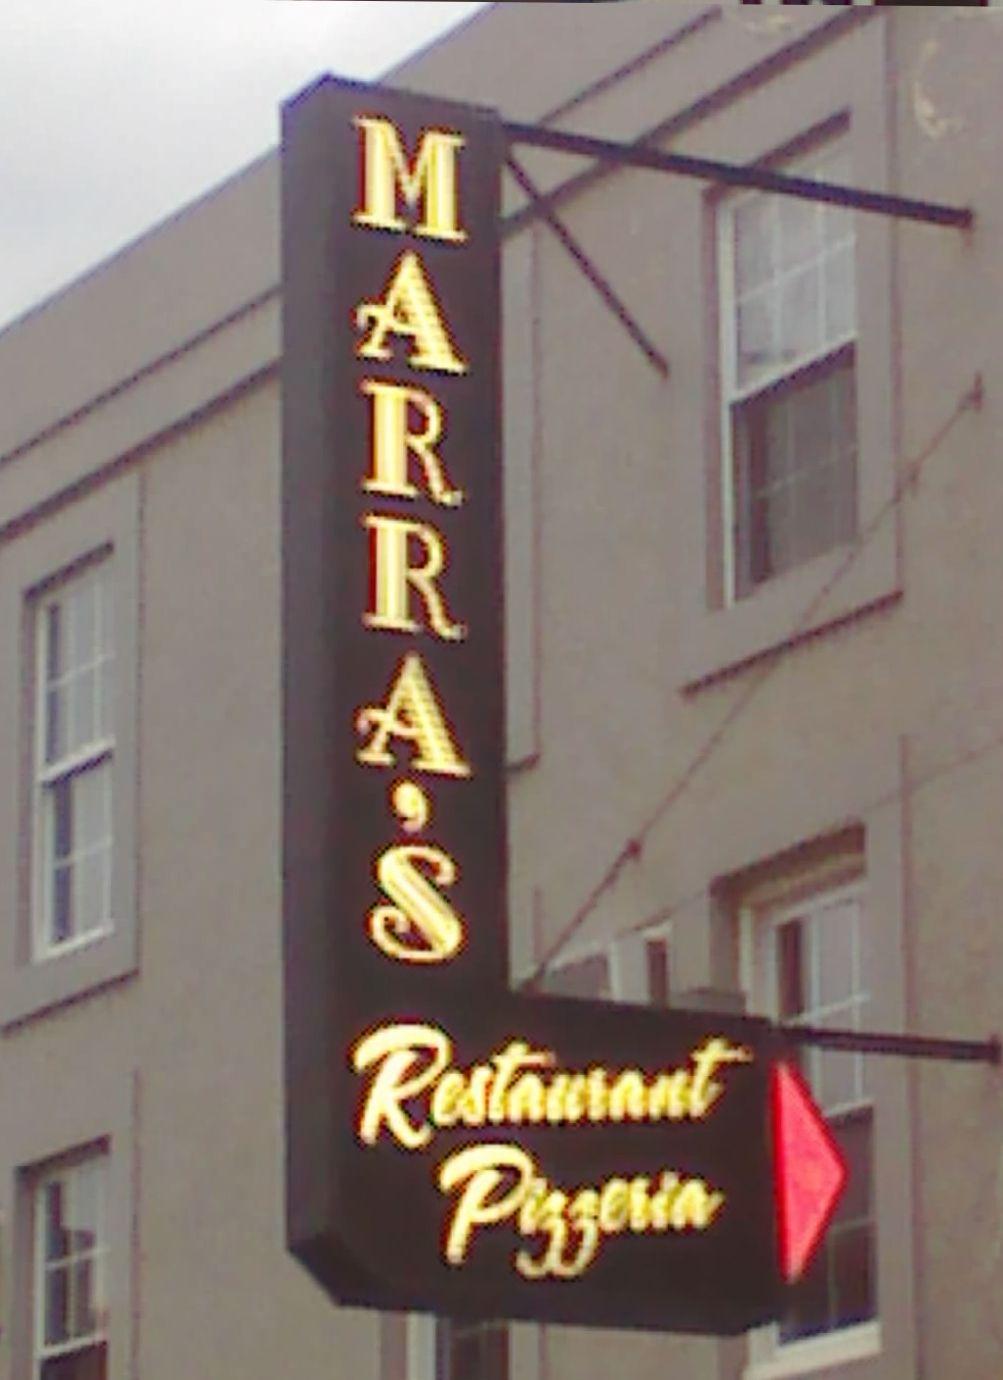 Marras Restaurant 1734 East Passyunk Avenue Of Philly In 2018